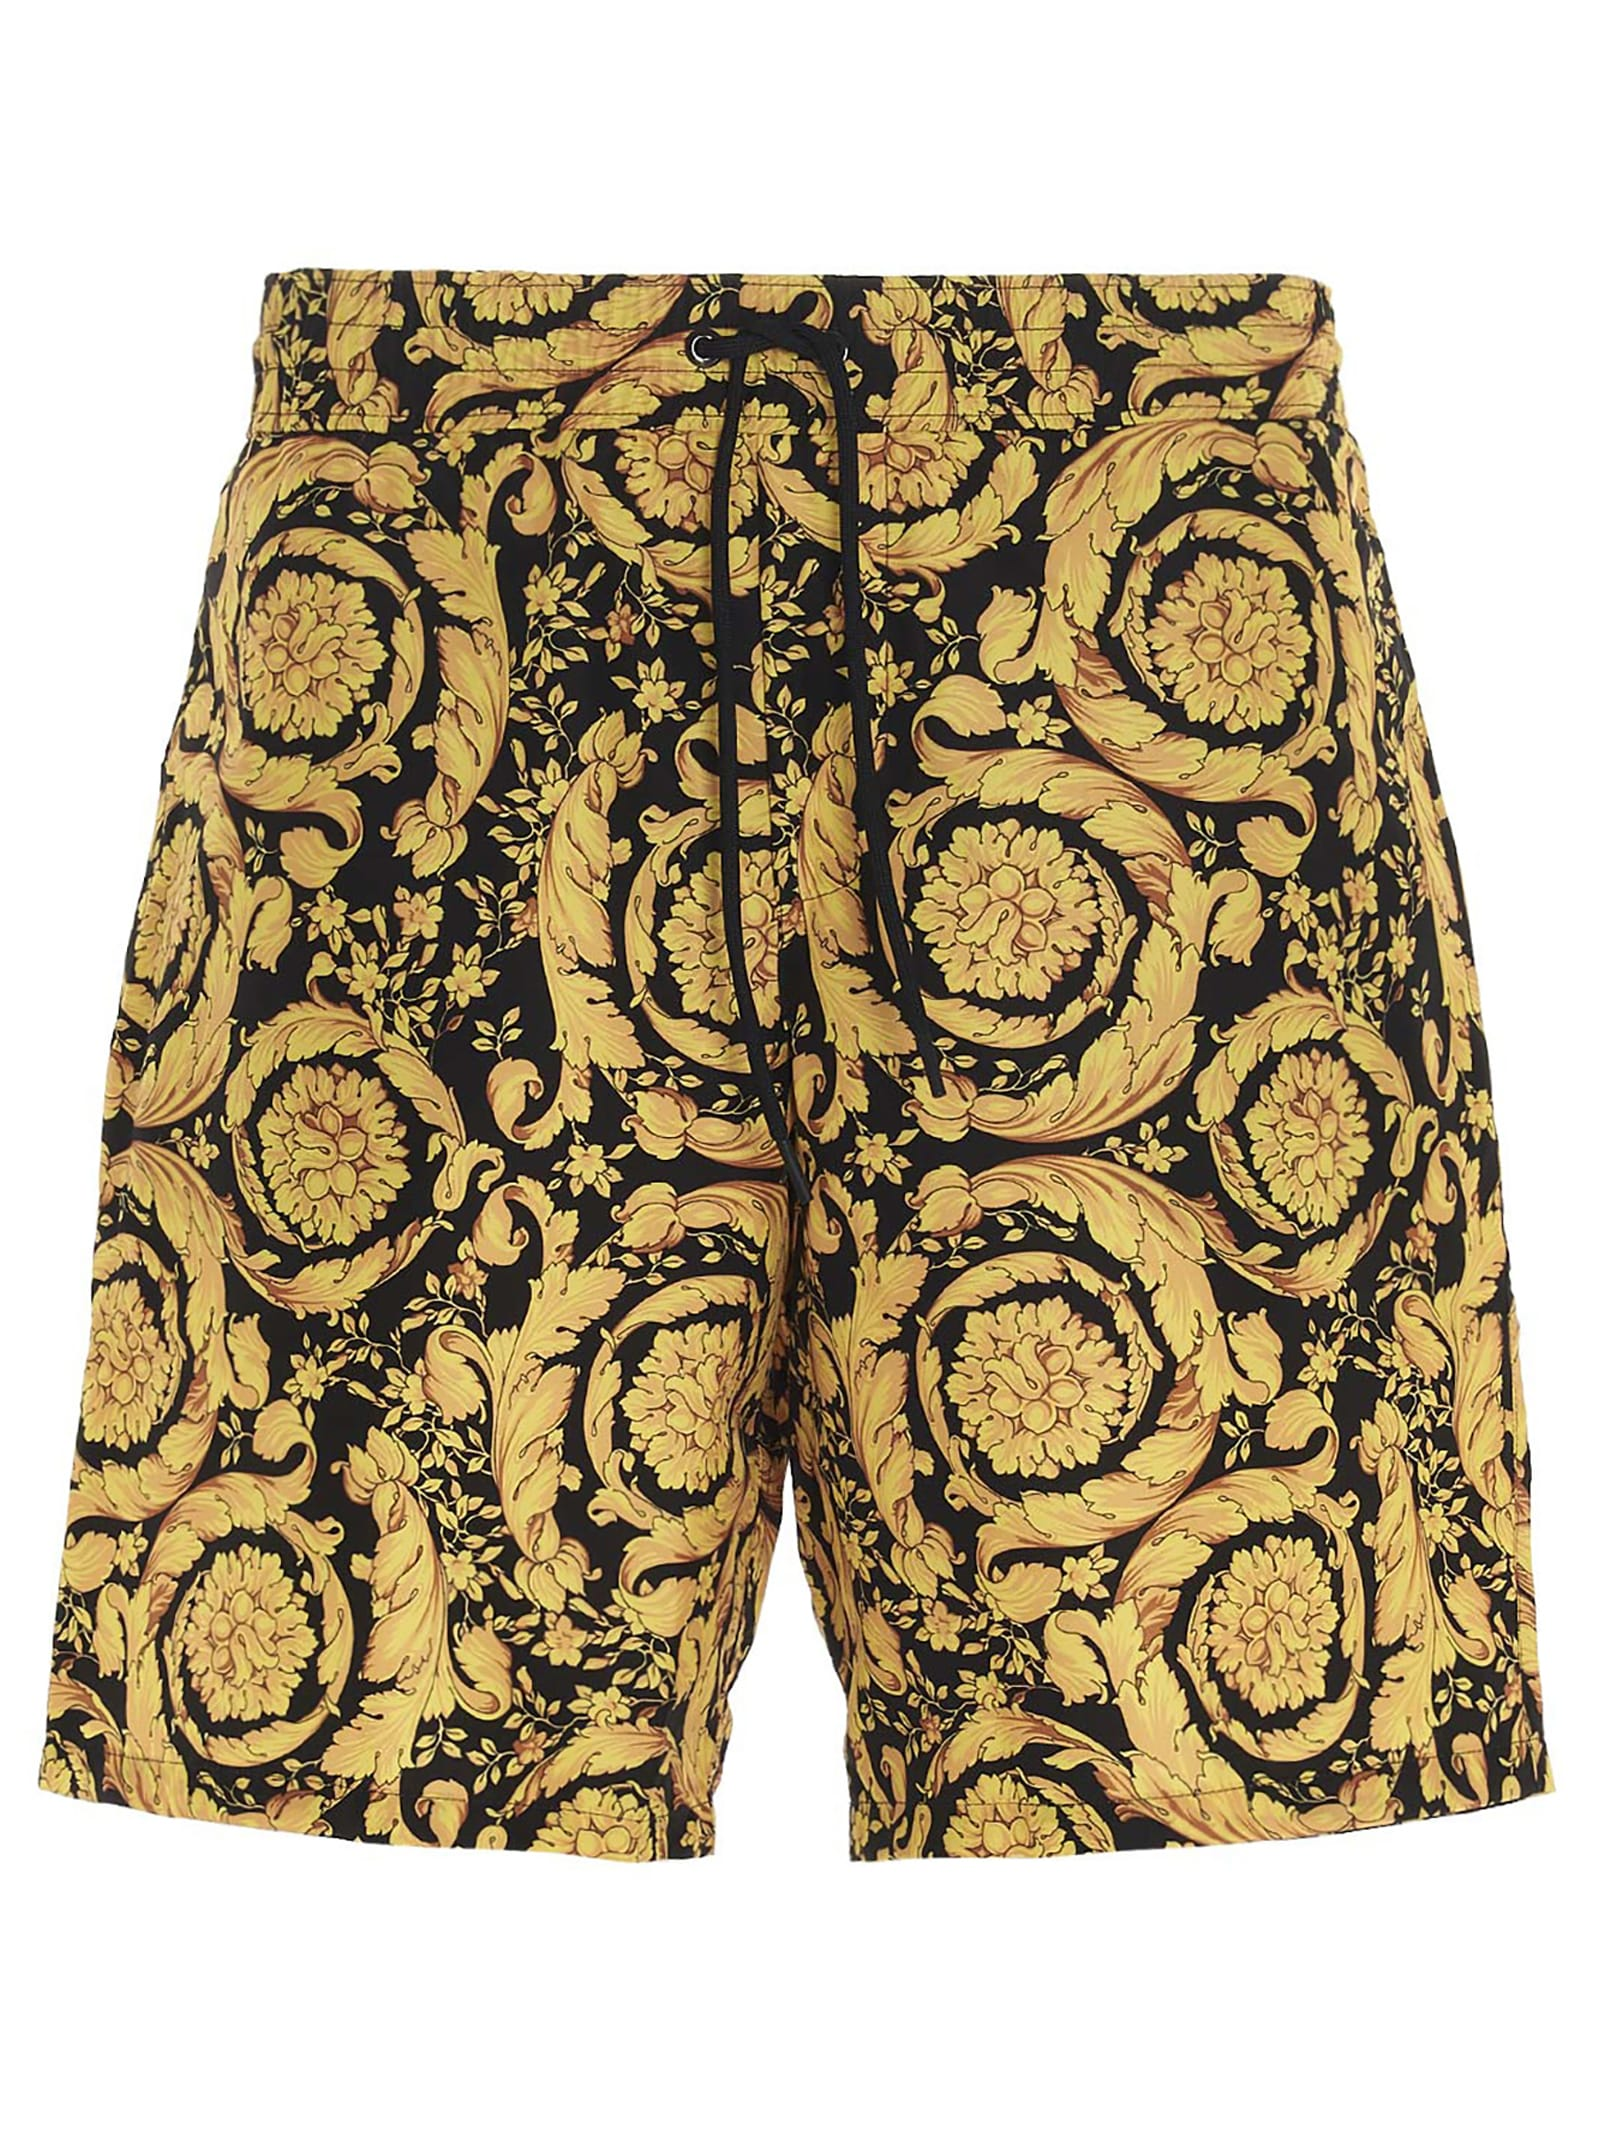 Versace Beachwears BAROCCO SWIMSUITS